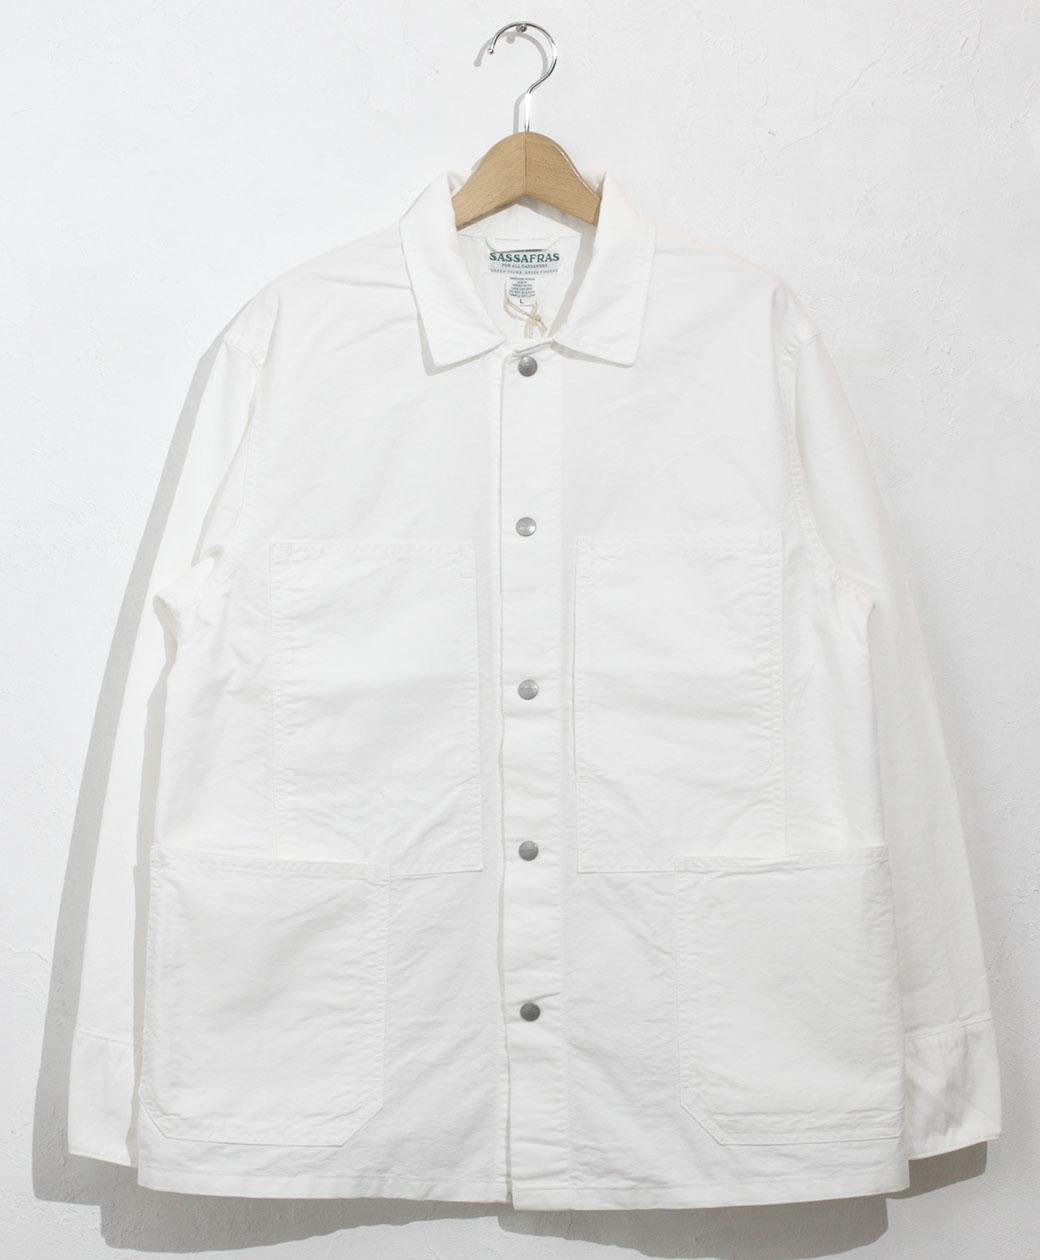 SASSAFRAS Transplant Jacket(Oxford)